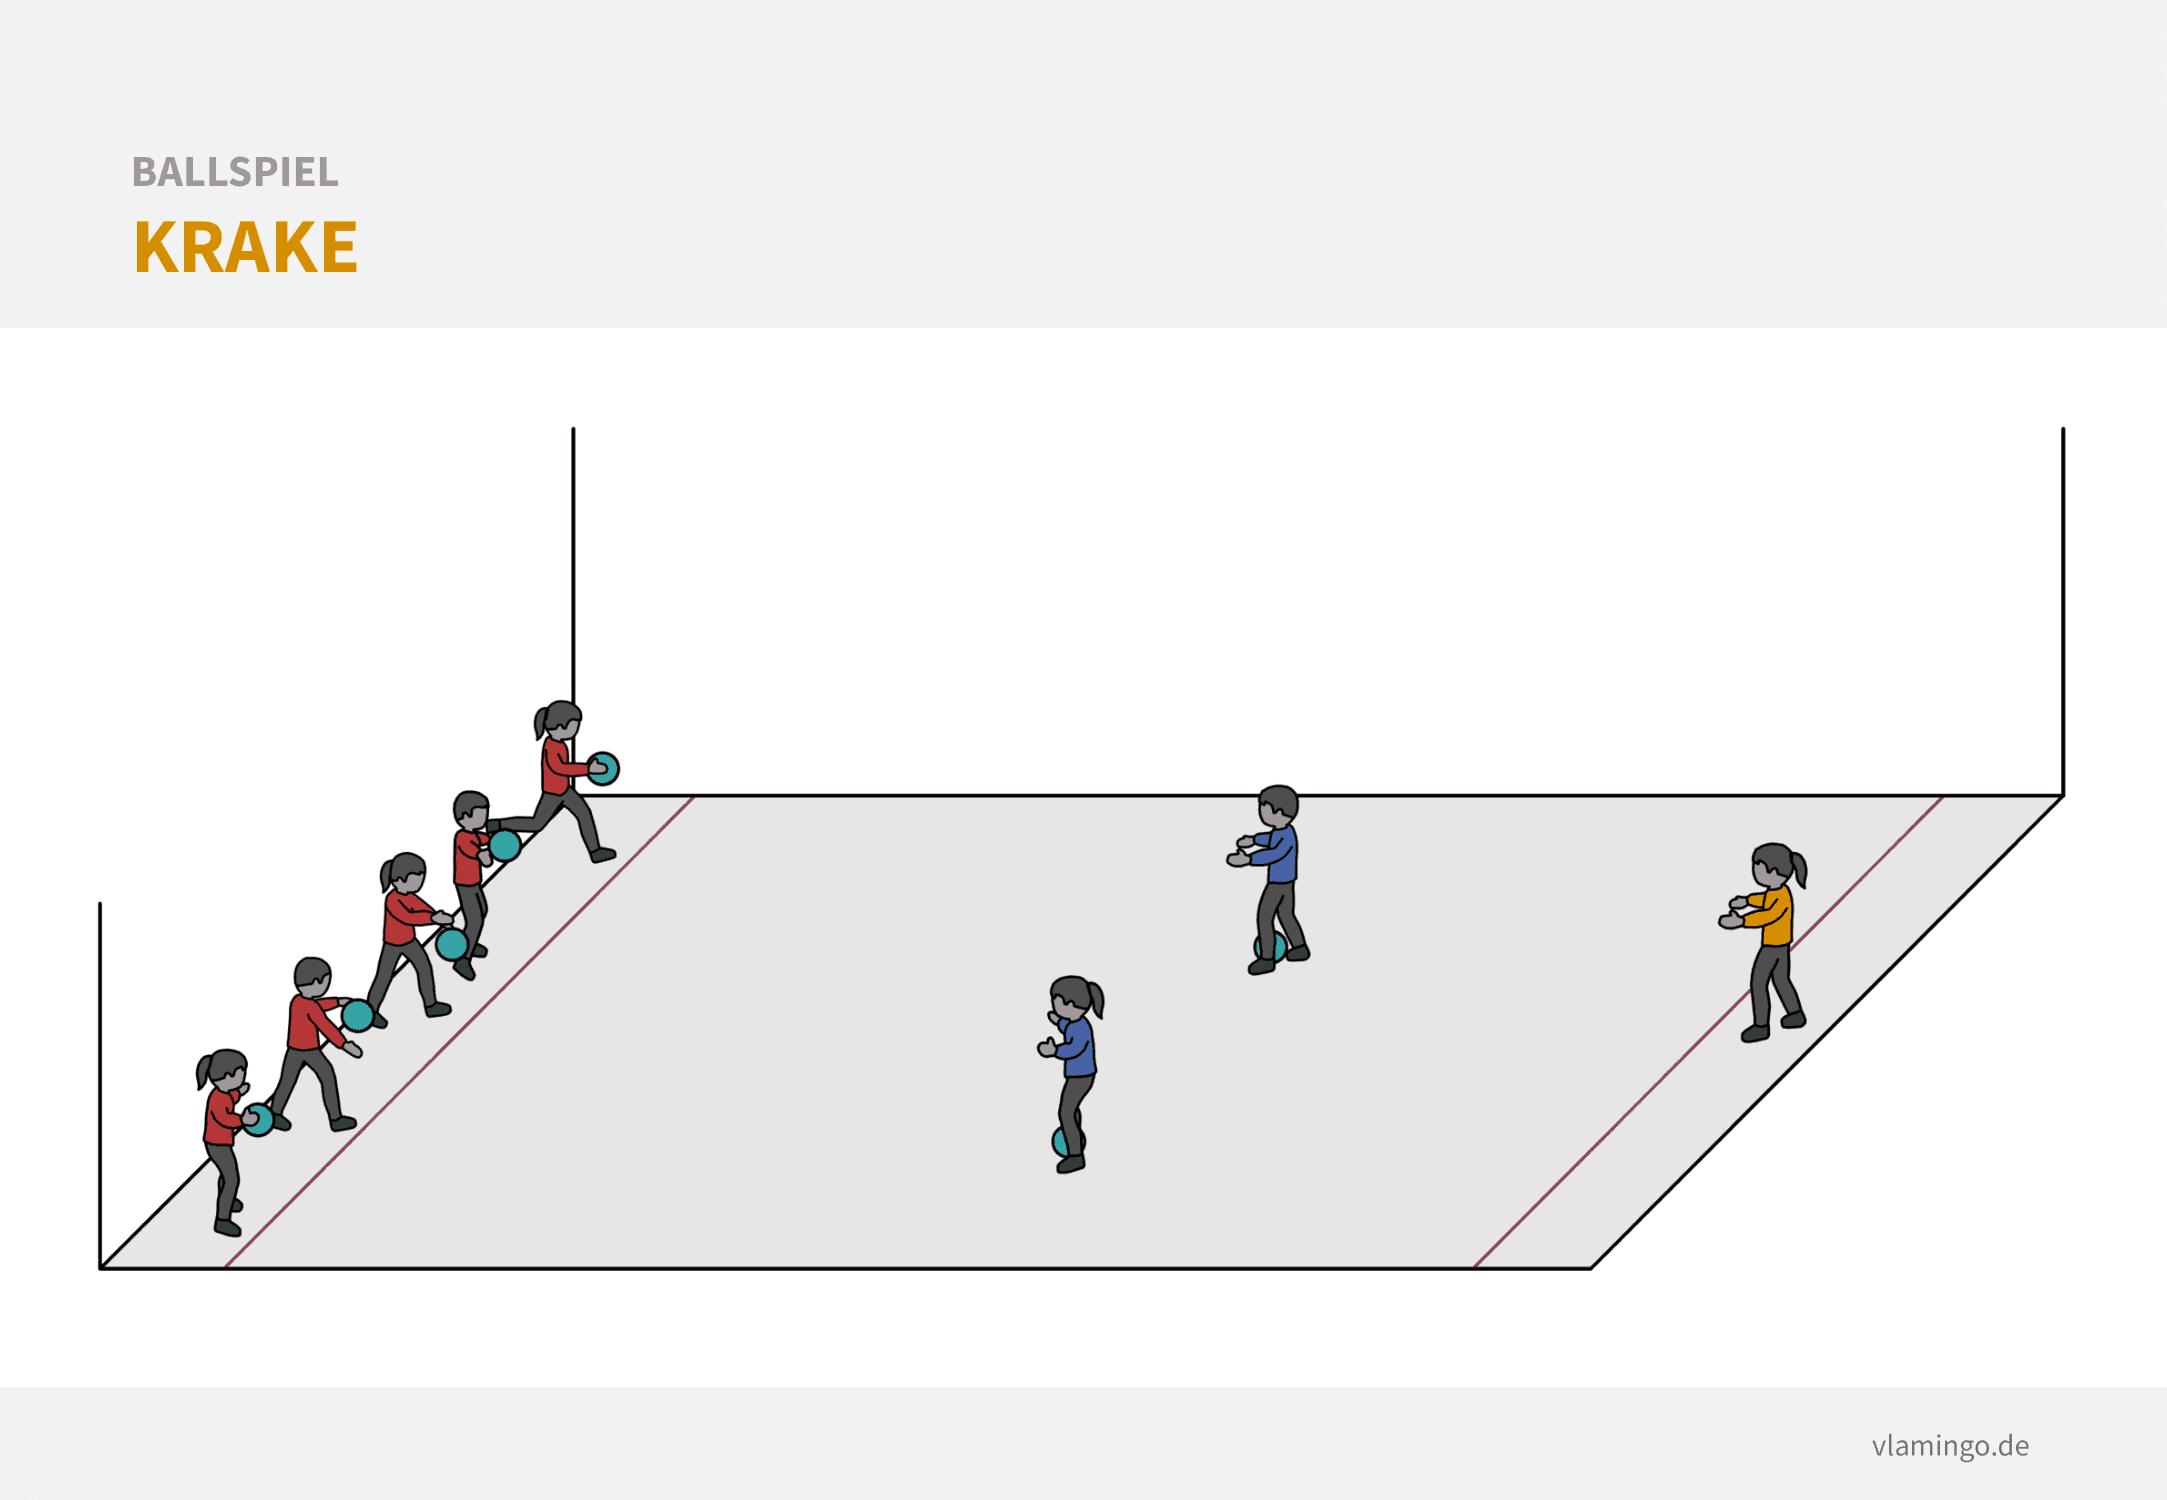 Basketball Aufwärmspiel: Die lustige Krake